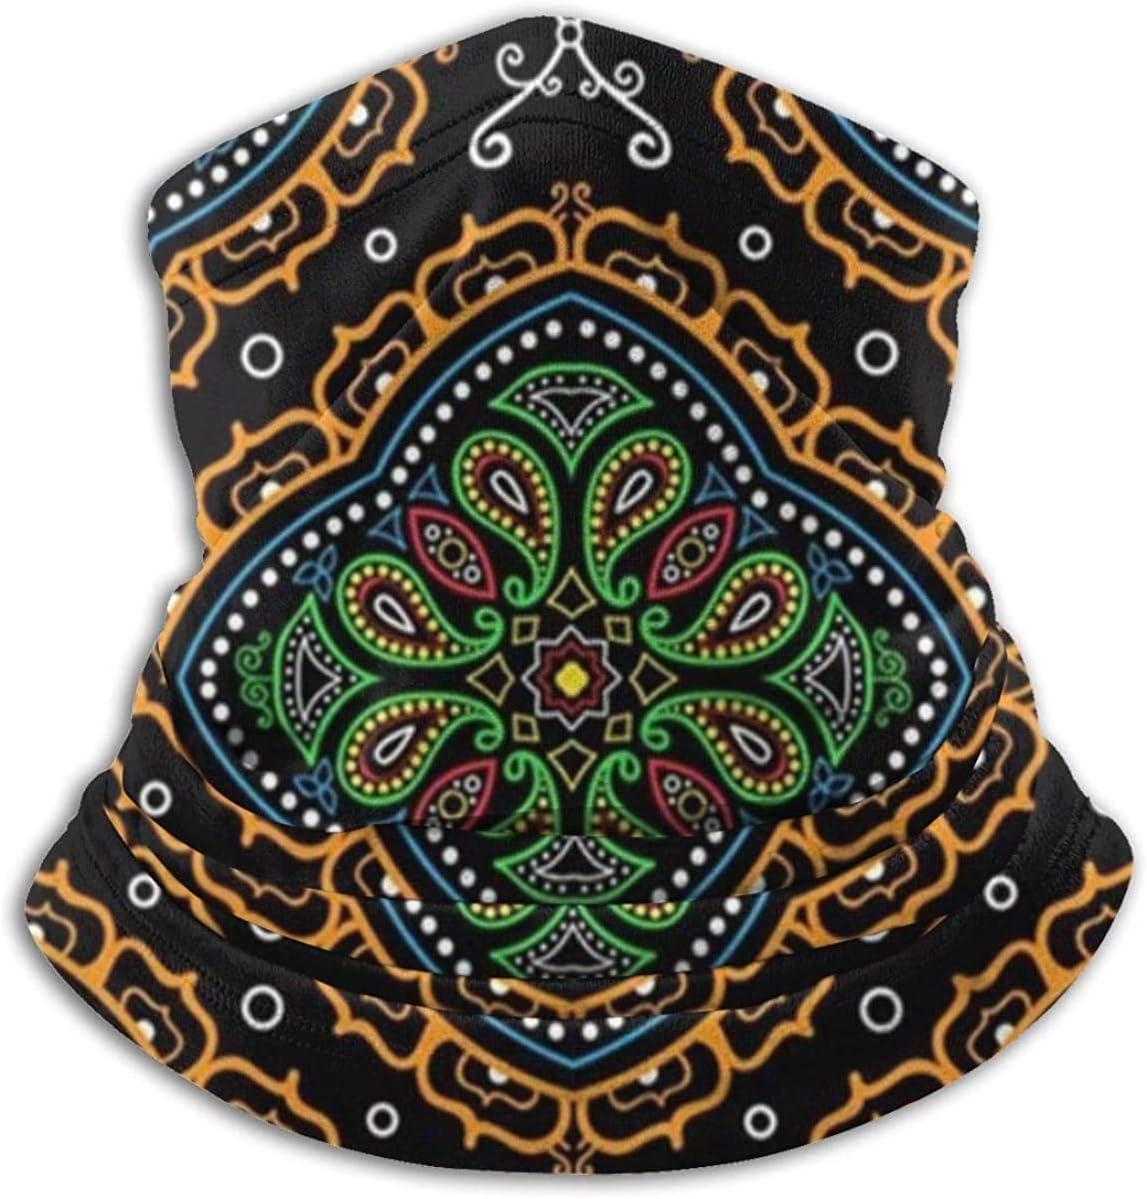 Lastbest Ornate Traditional Oriental Vintage Neck Warmer Multifunction Scarf Hat Neck Gaiter Neck Cap Bala Windproof Neck Heating Wrap Outdoor Sports